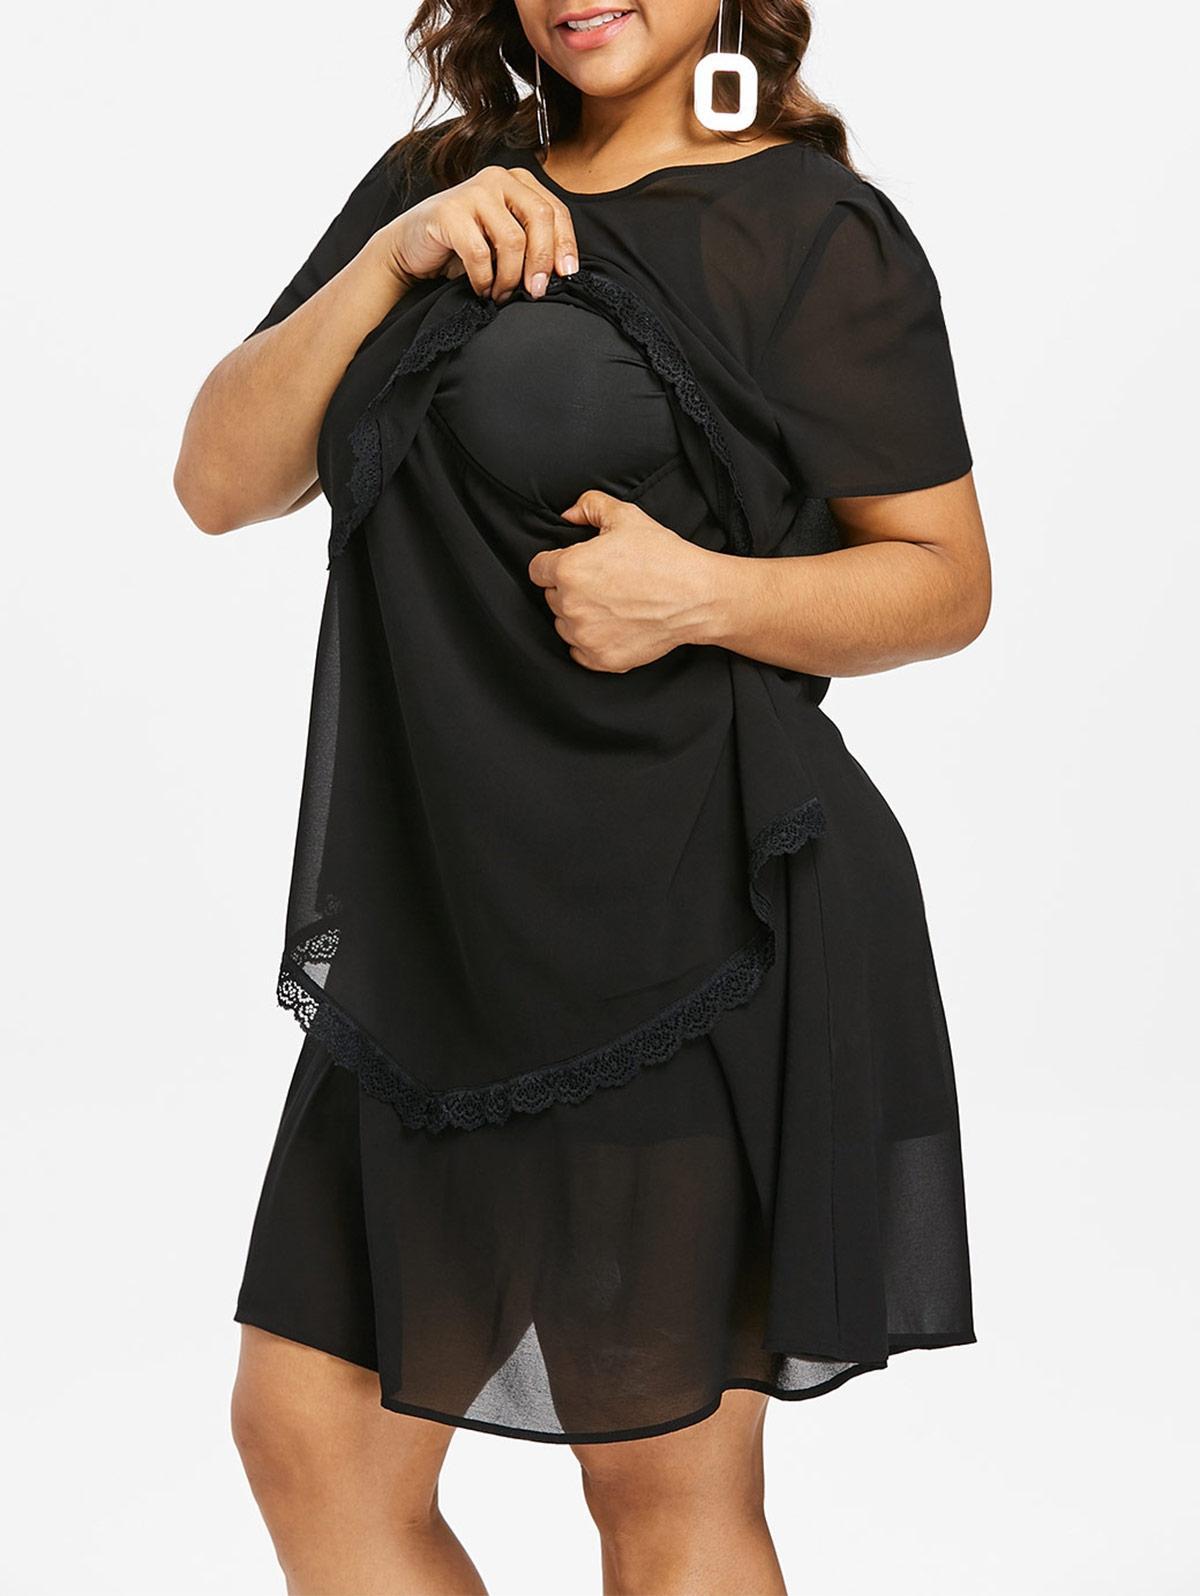 5db4356723dd5 Plus Size Layered Nursing Shift Dress Elegant Cocktail Dresses Summer  Cocktail Dresses From Lj_2014, $20.69| DHgate.Com